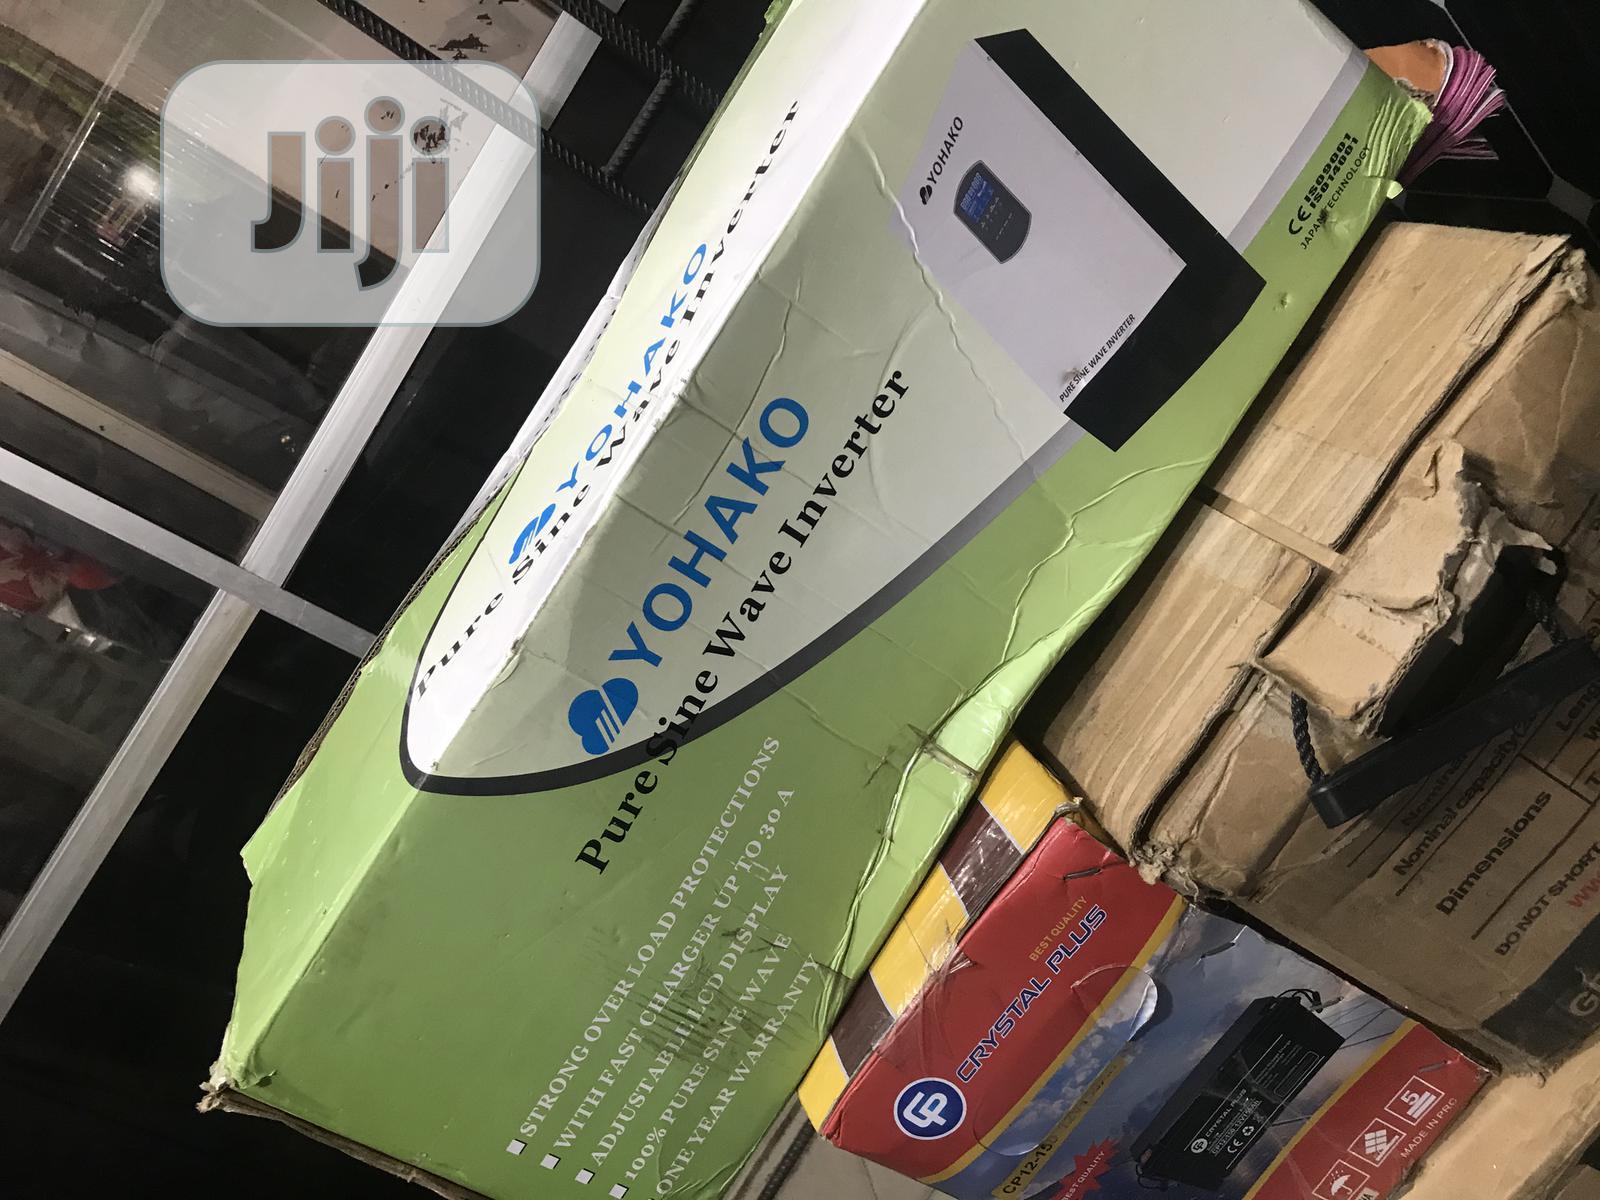 Yohako 2.5kva 24vos Inverter Available